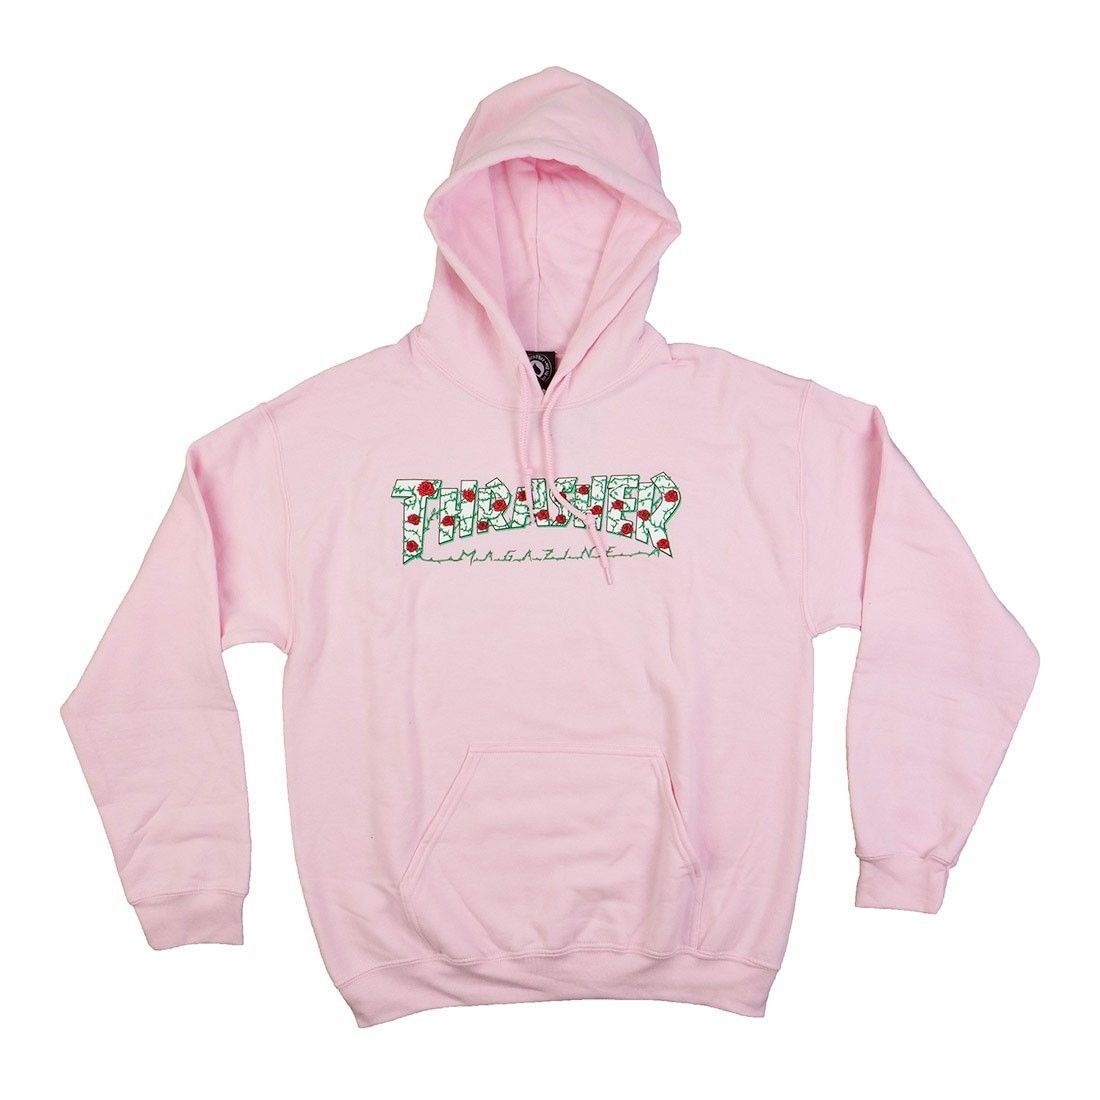 Men 159067 Thrasher Skateboard Magazine Roses Pink Hoodie Sweatshirt Small Medium Rare Buy It Now Only Pink Hoodie Sweatshirts Sweatshirts Hoodie Hoodies [ 1100 x 1100 Pixel ]